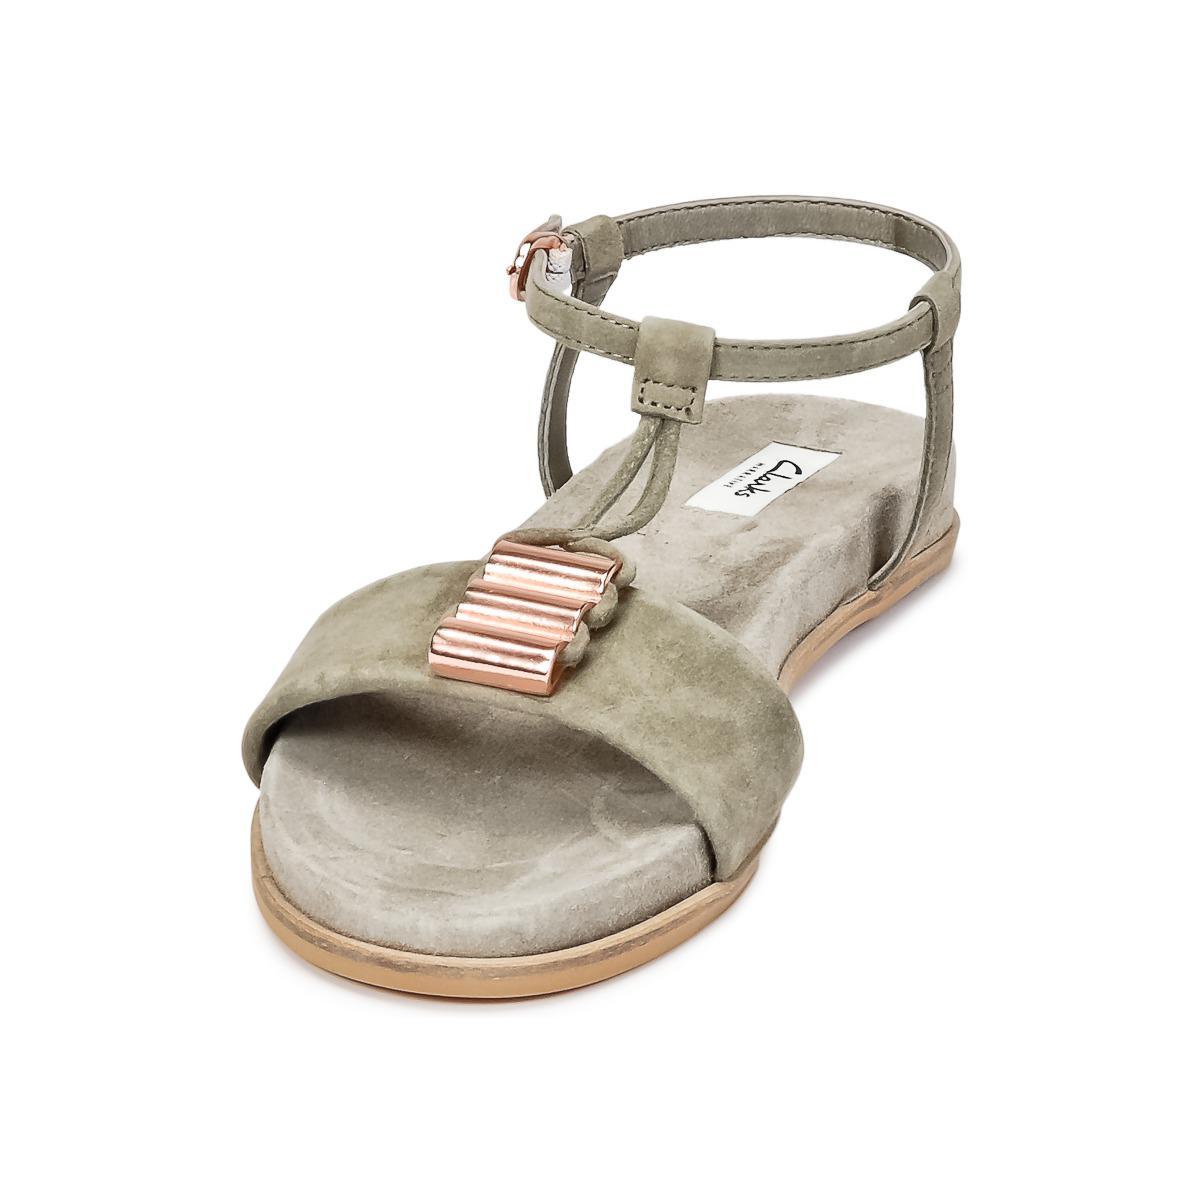 47c9a4005065 Clarks Agean Cool Women s Sandals In Grey in Gray - Lyst